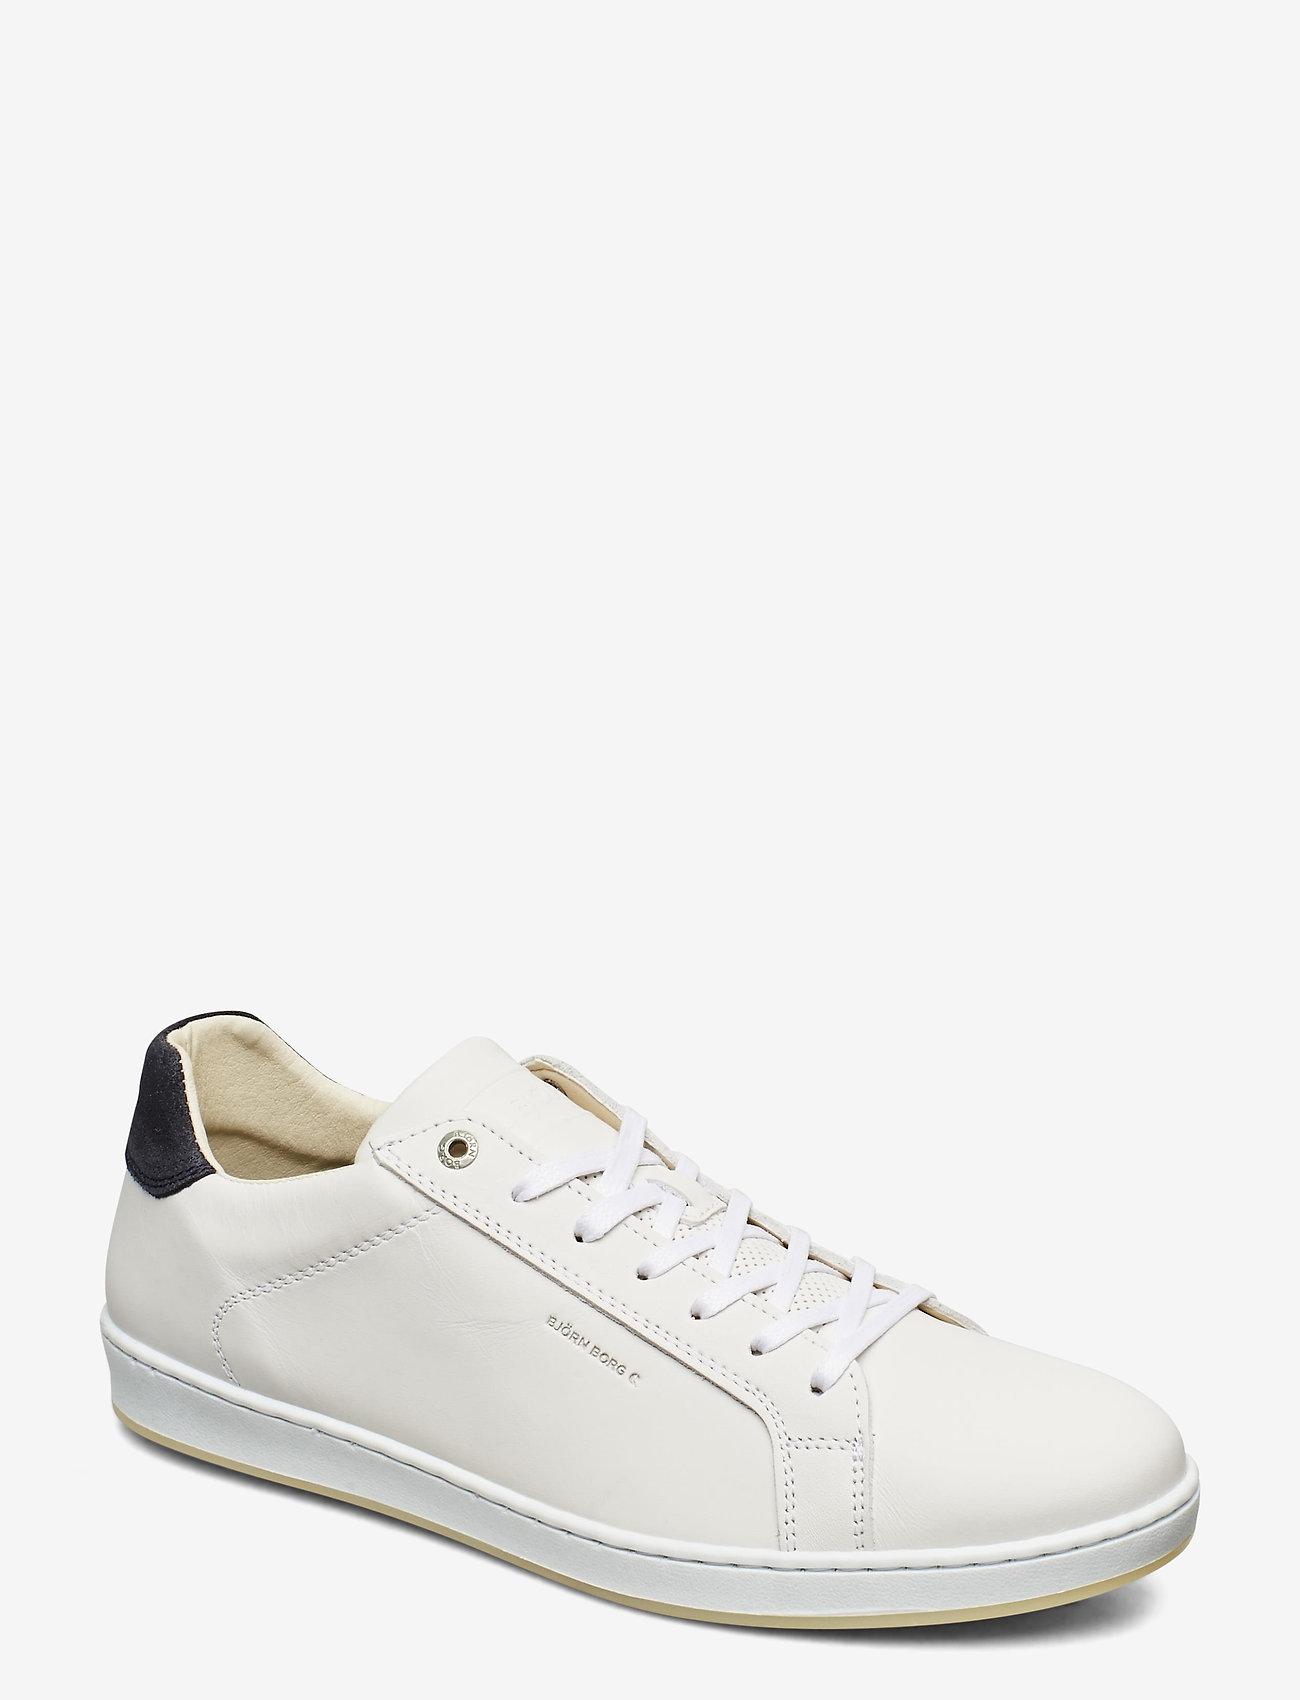 Björn Borg - TOBIE BSC M - laag sneakers - white - 0